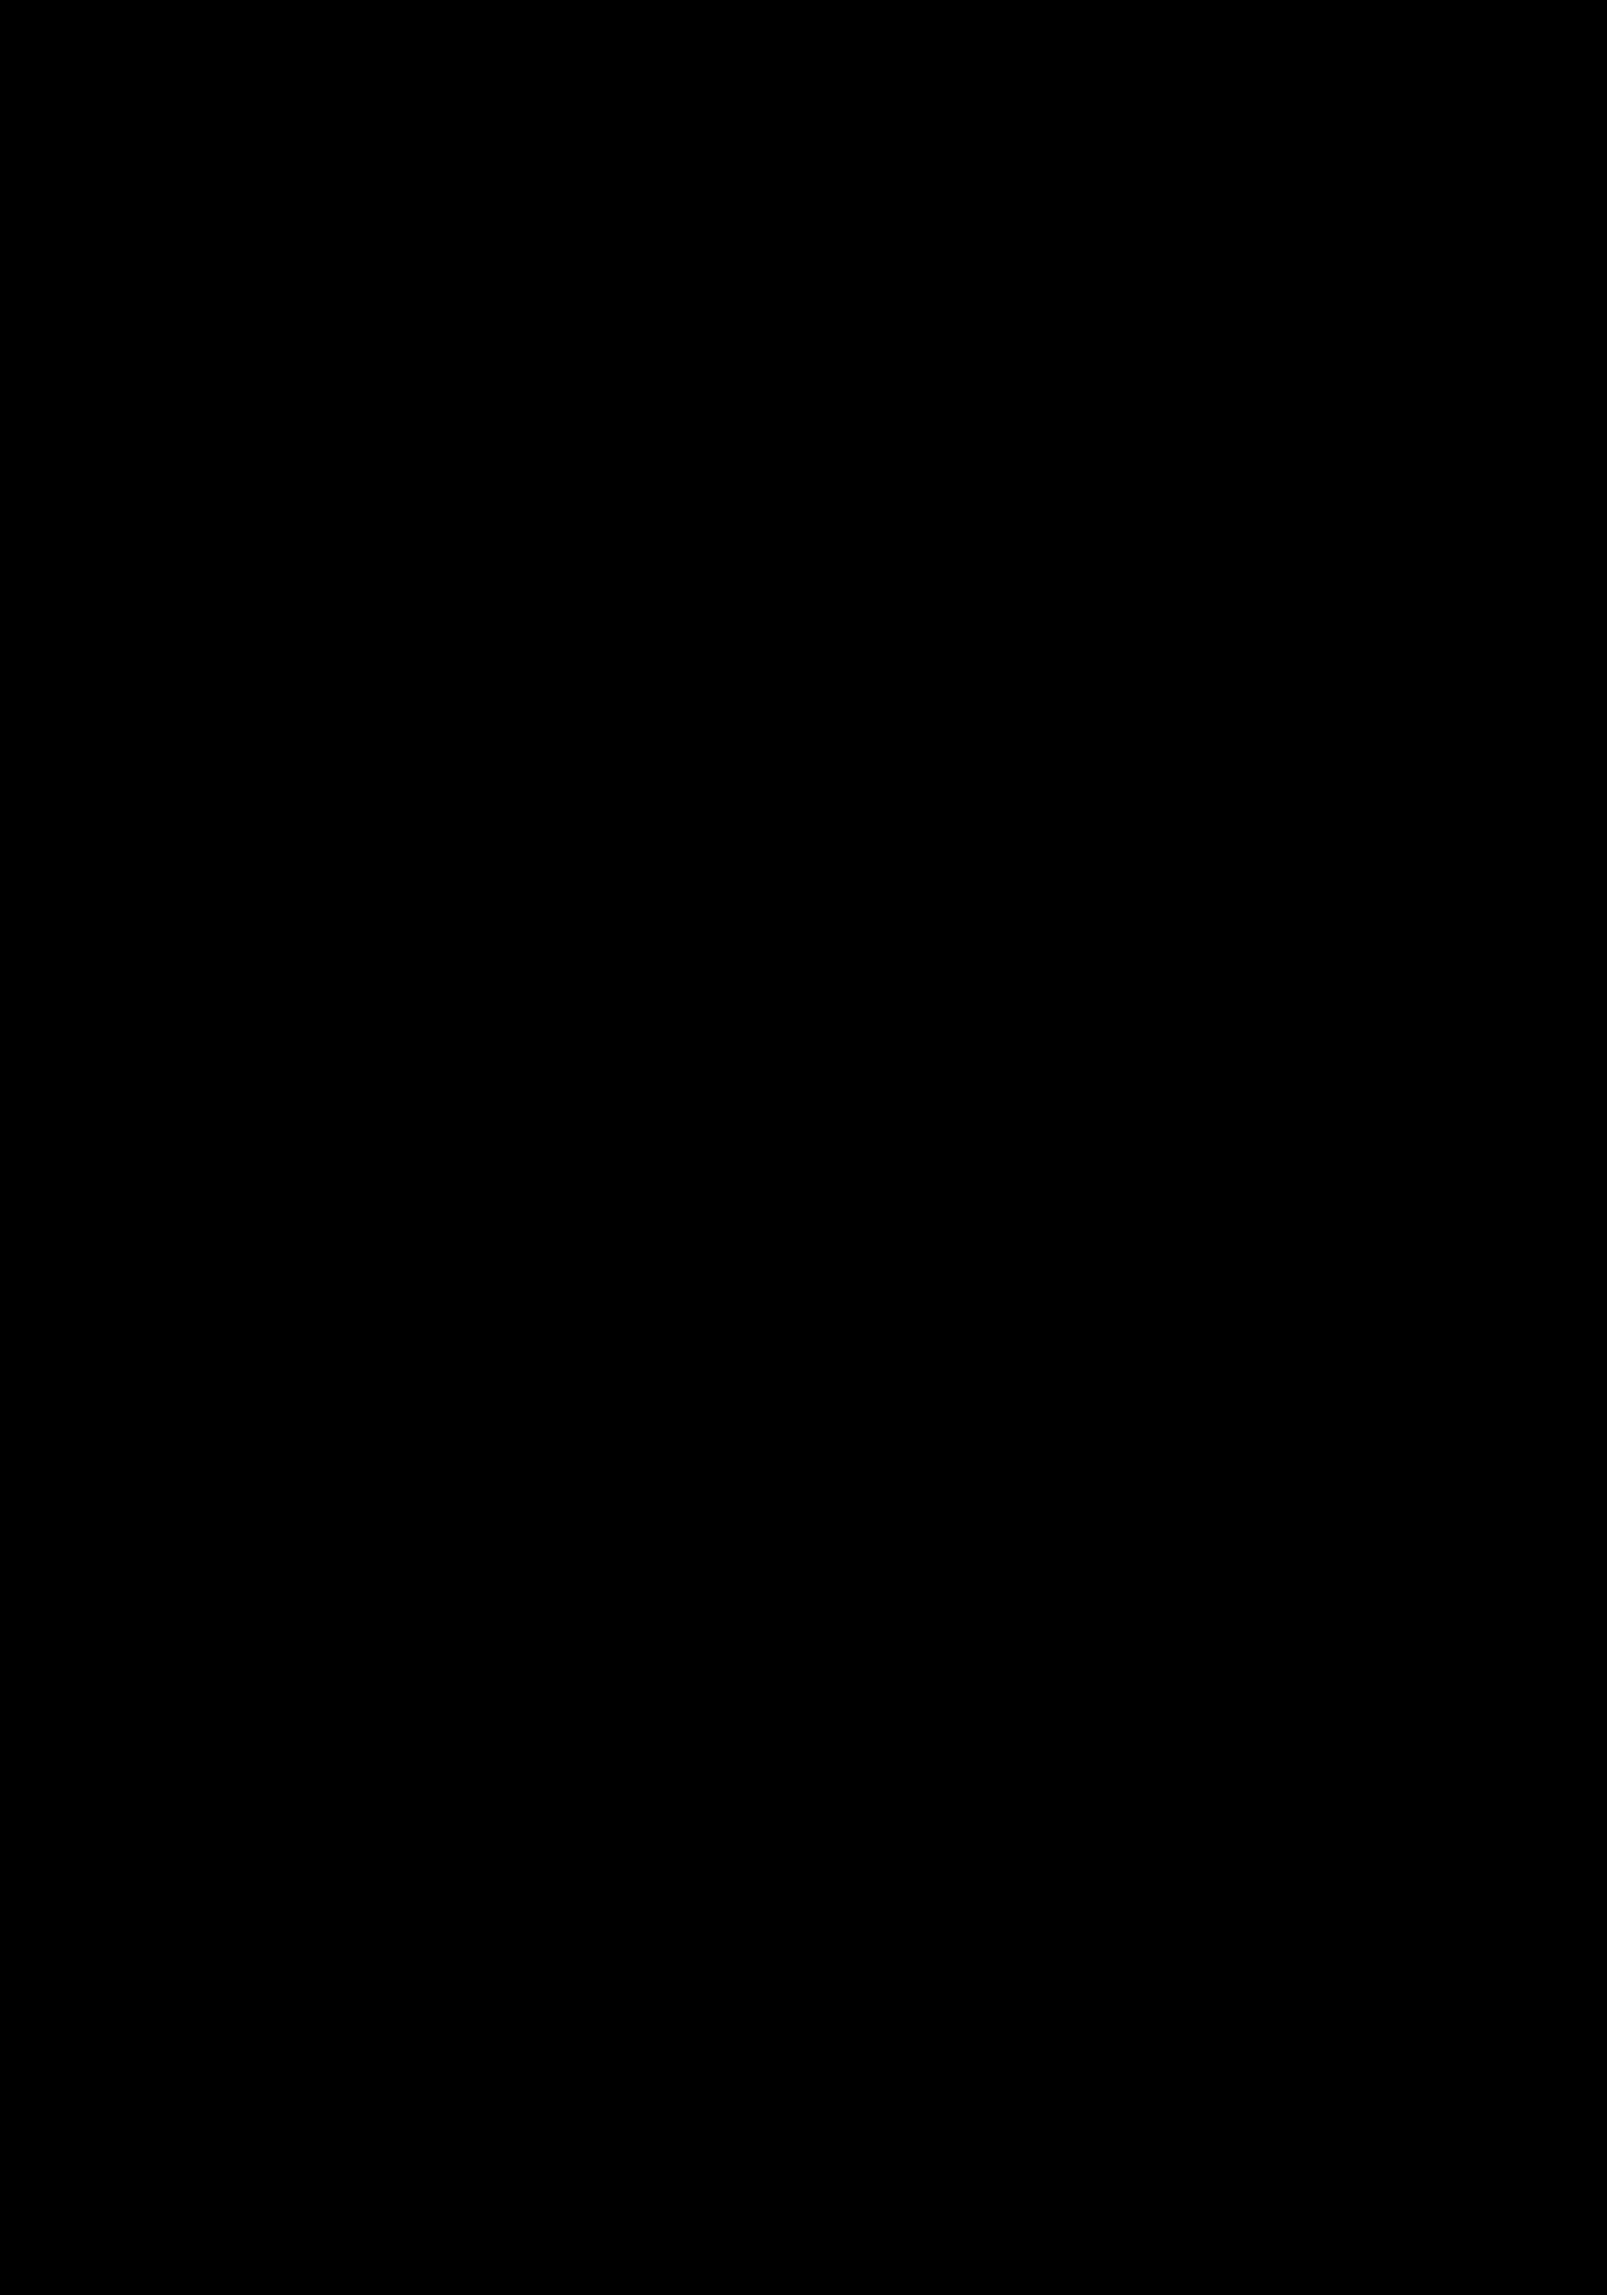 Clipart stylized big image. Cross clip art silhouette